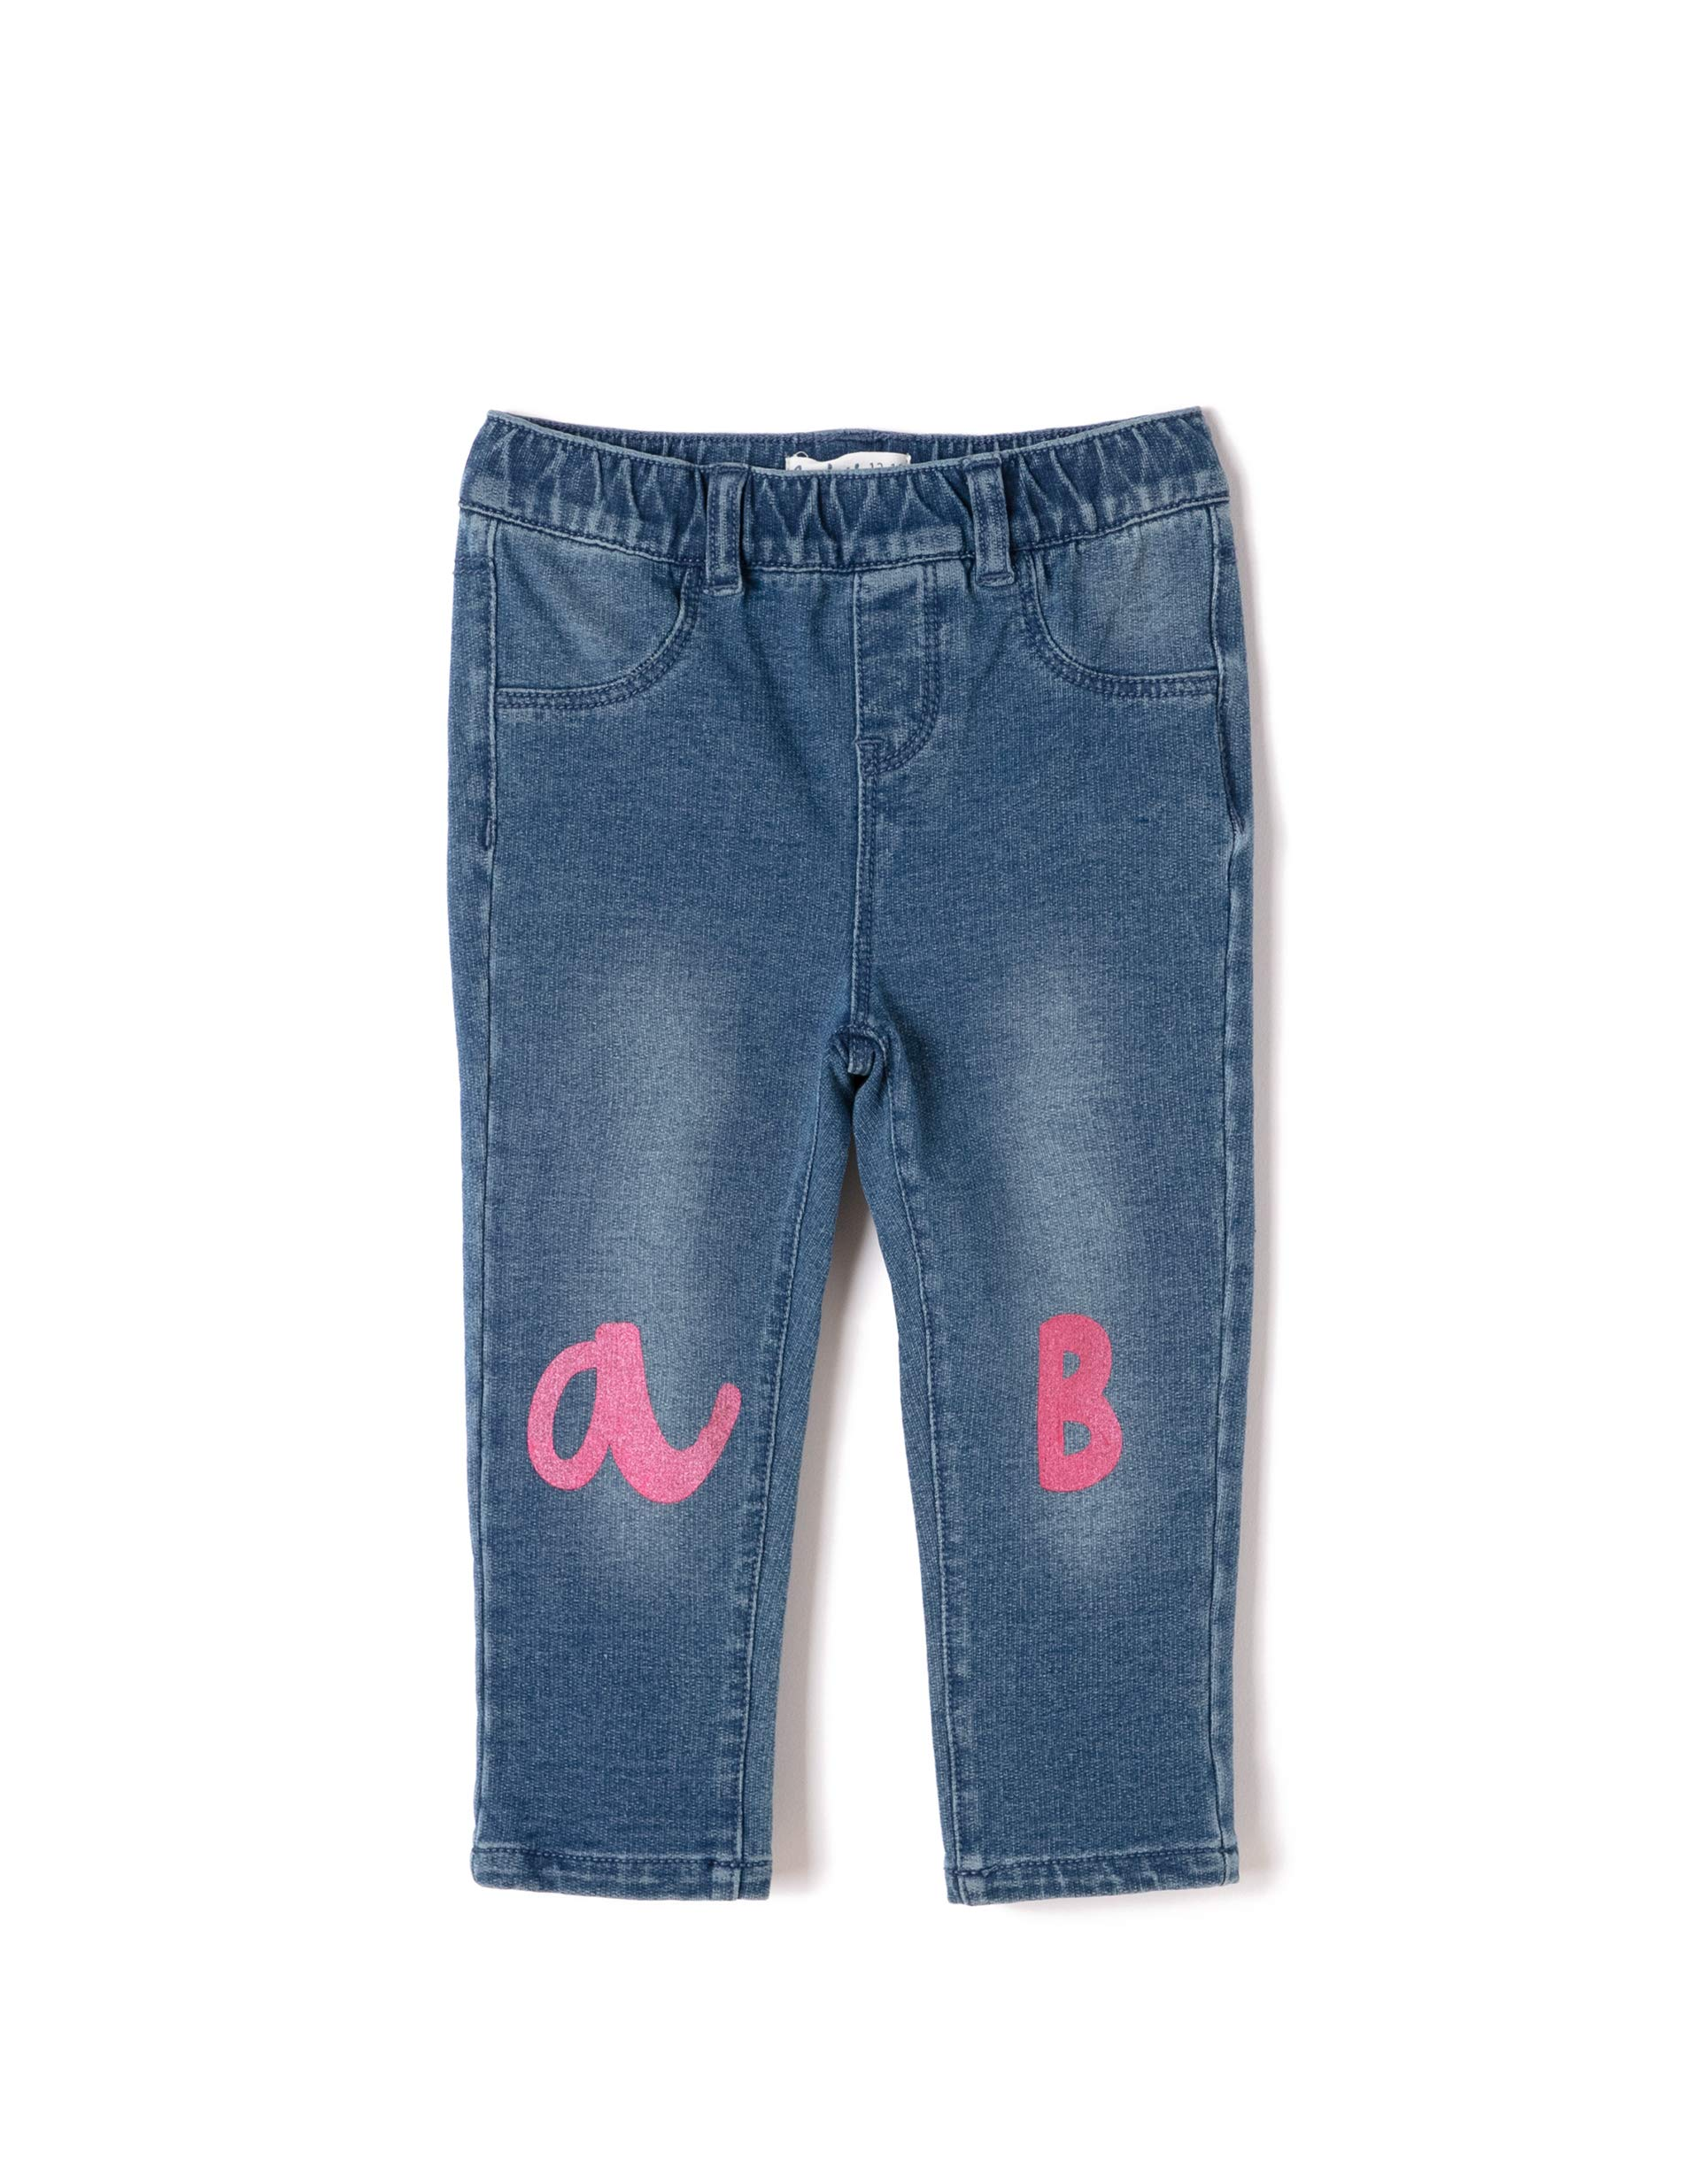 ZIPPY Jeggings Star Pantalones para Bebés 1